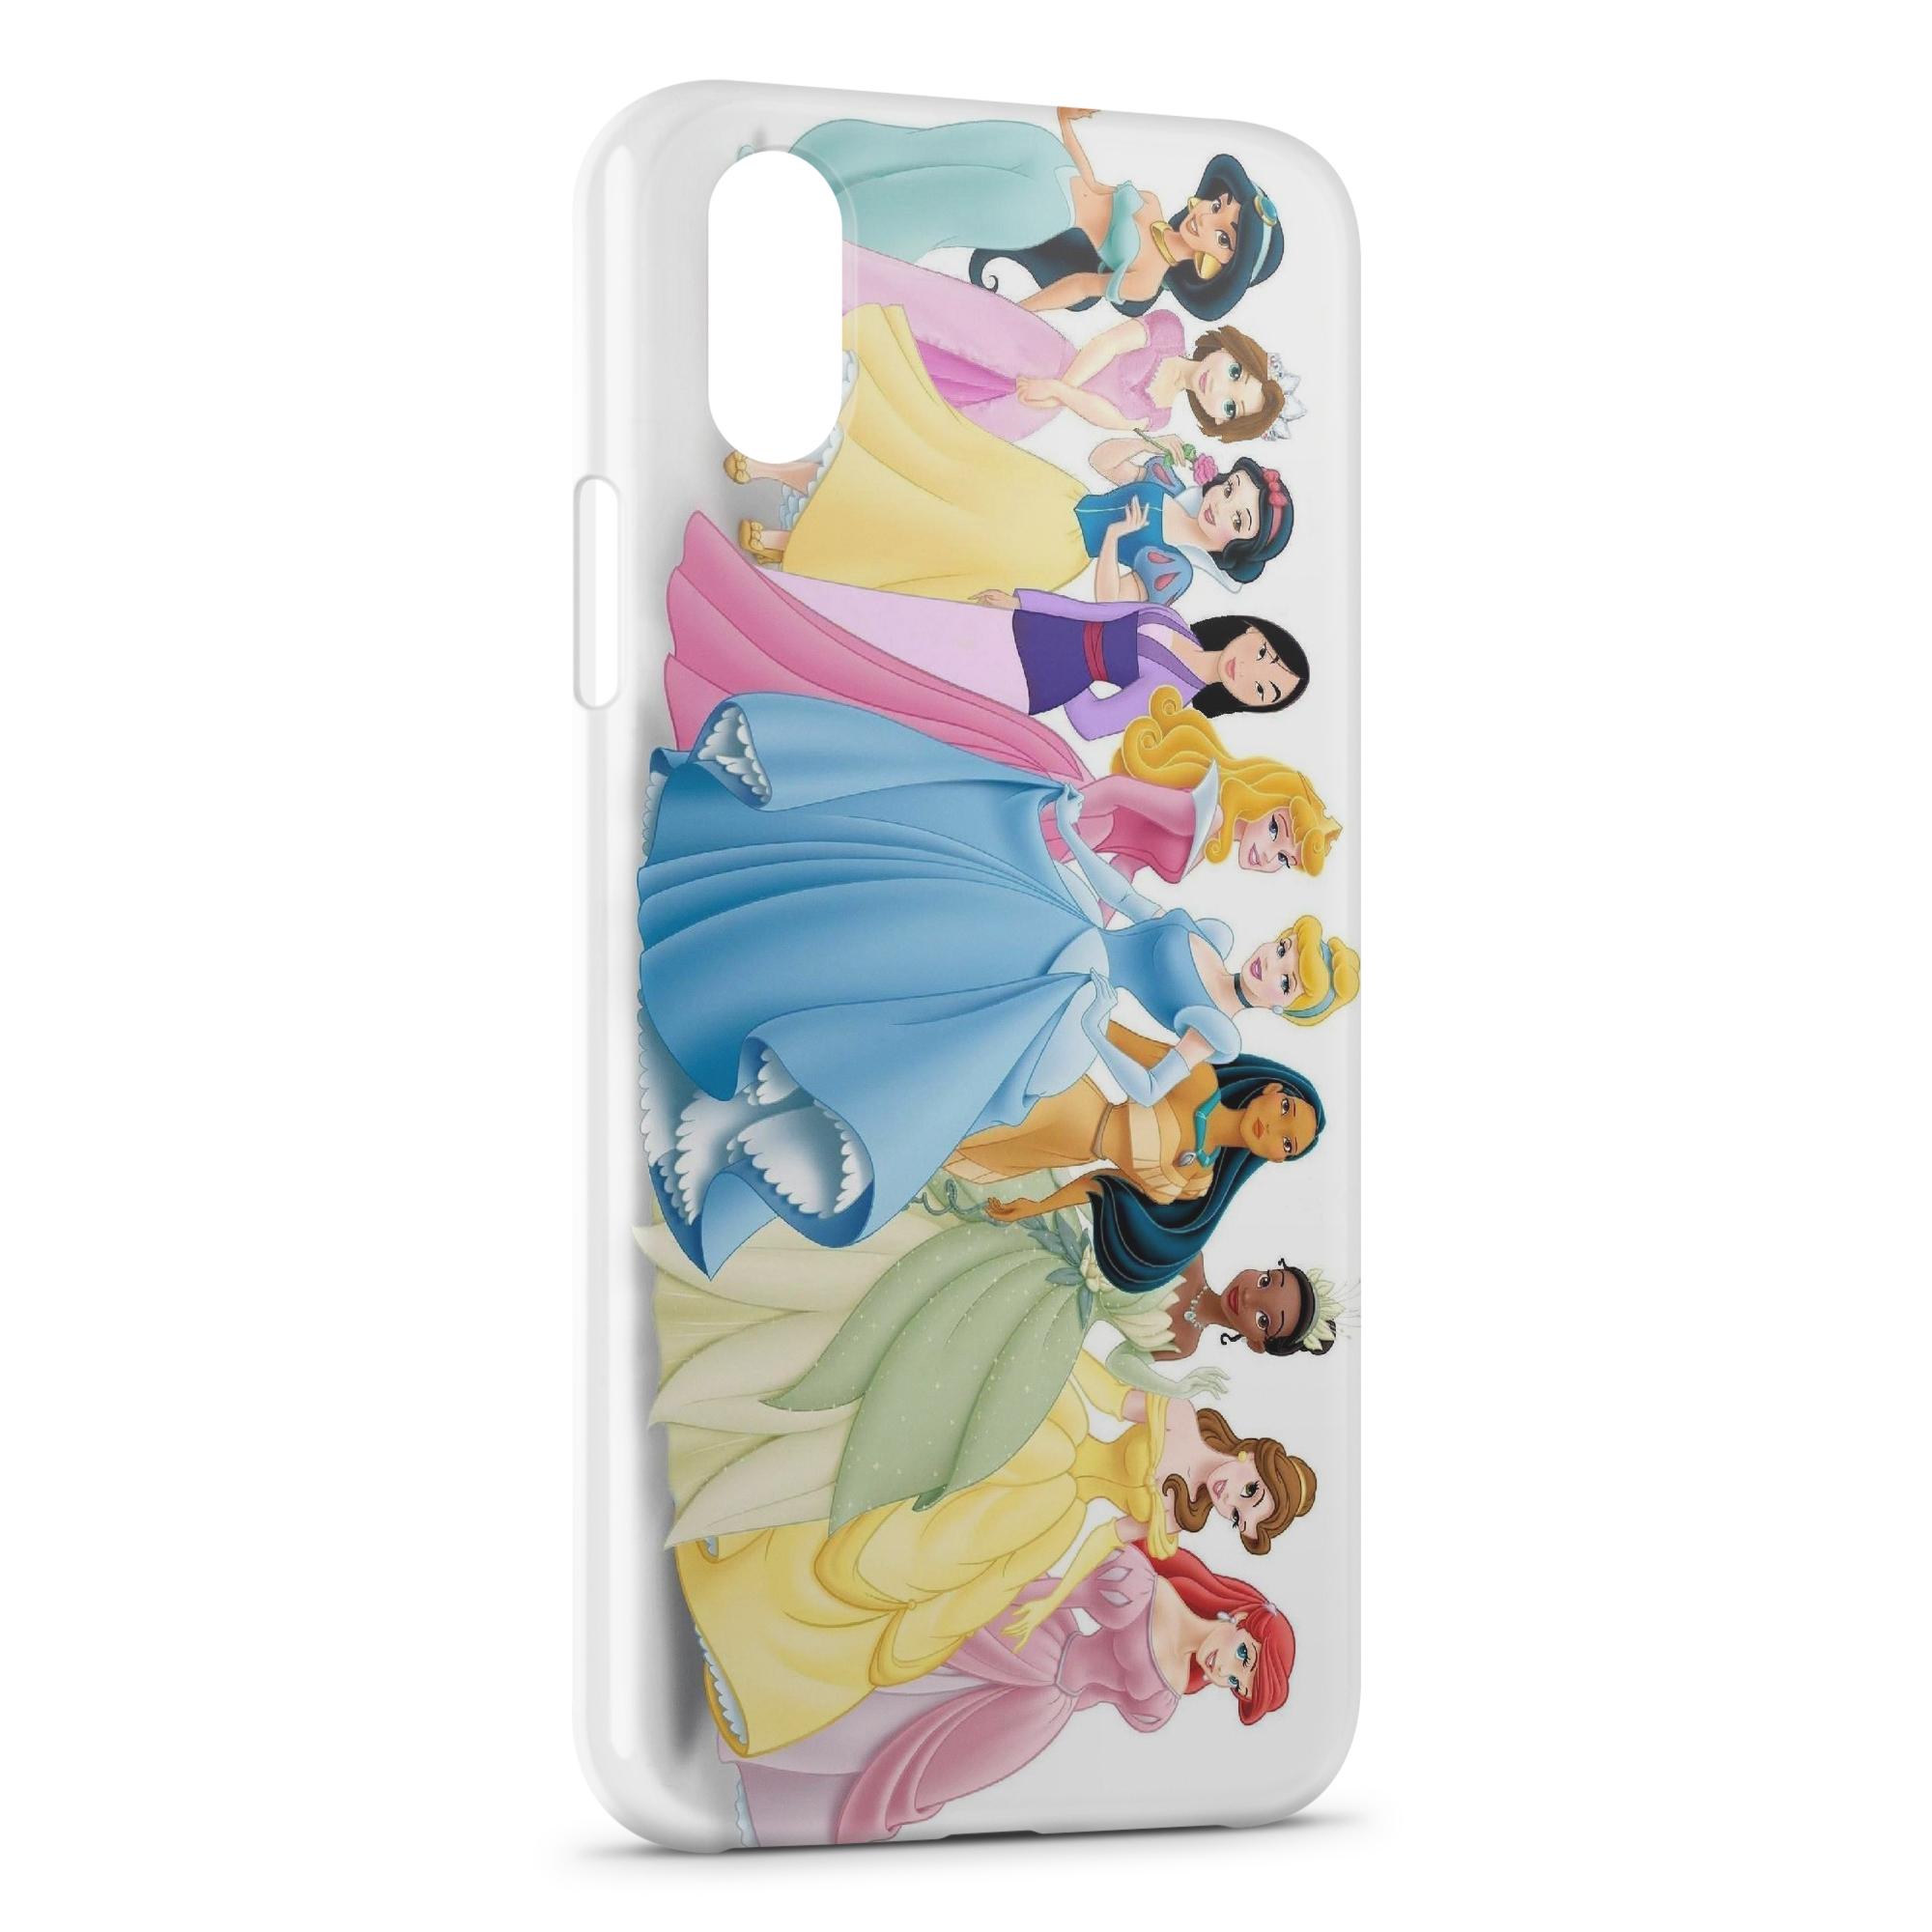 Coque iPhone X XS Disney Princess 1